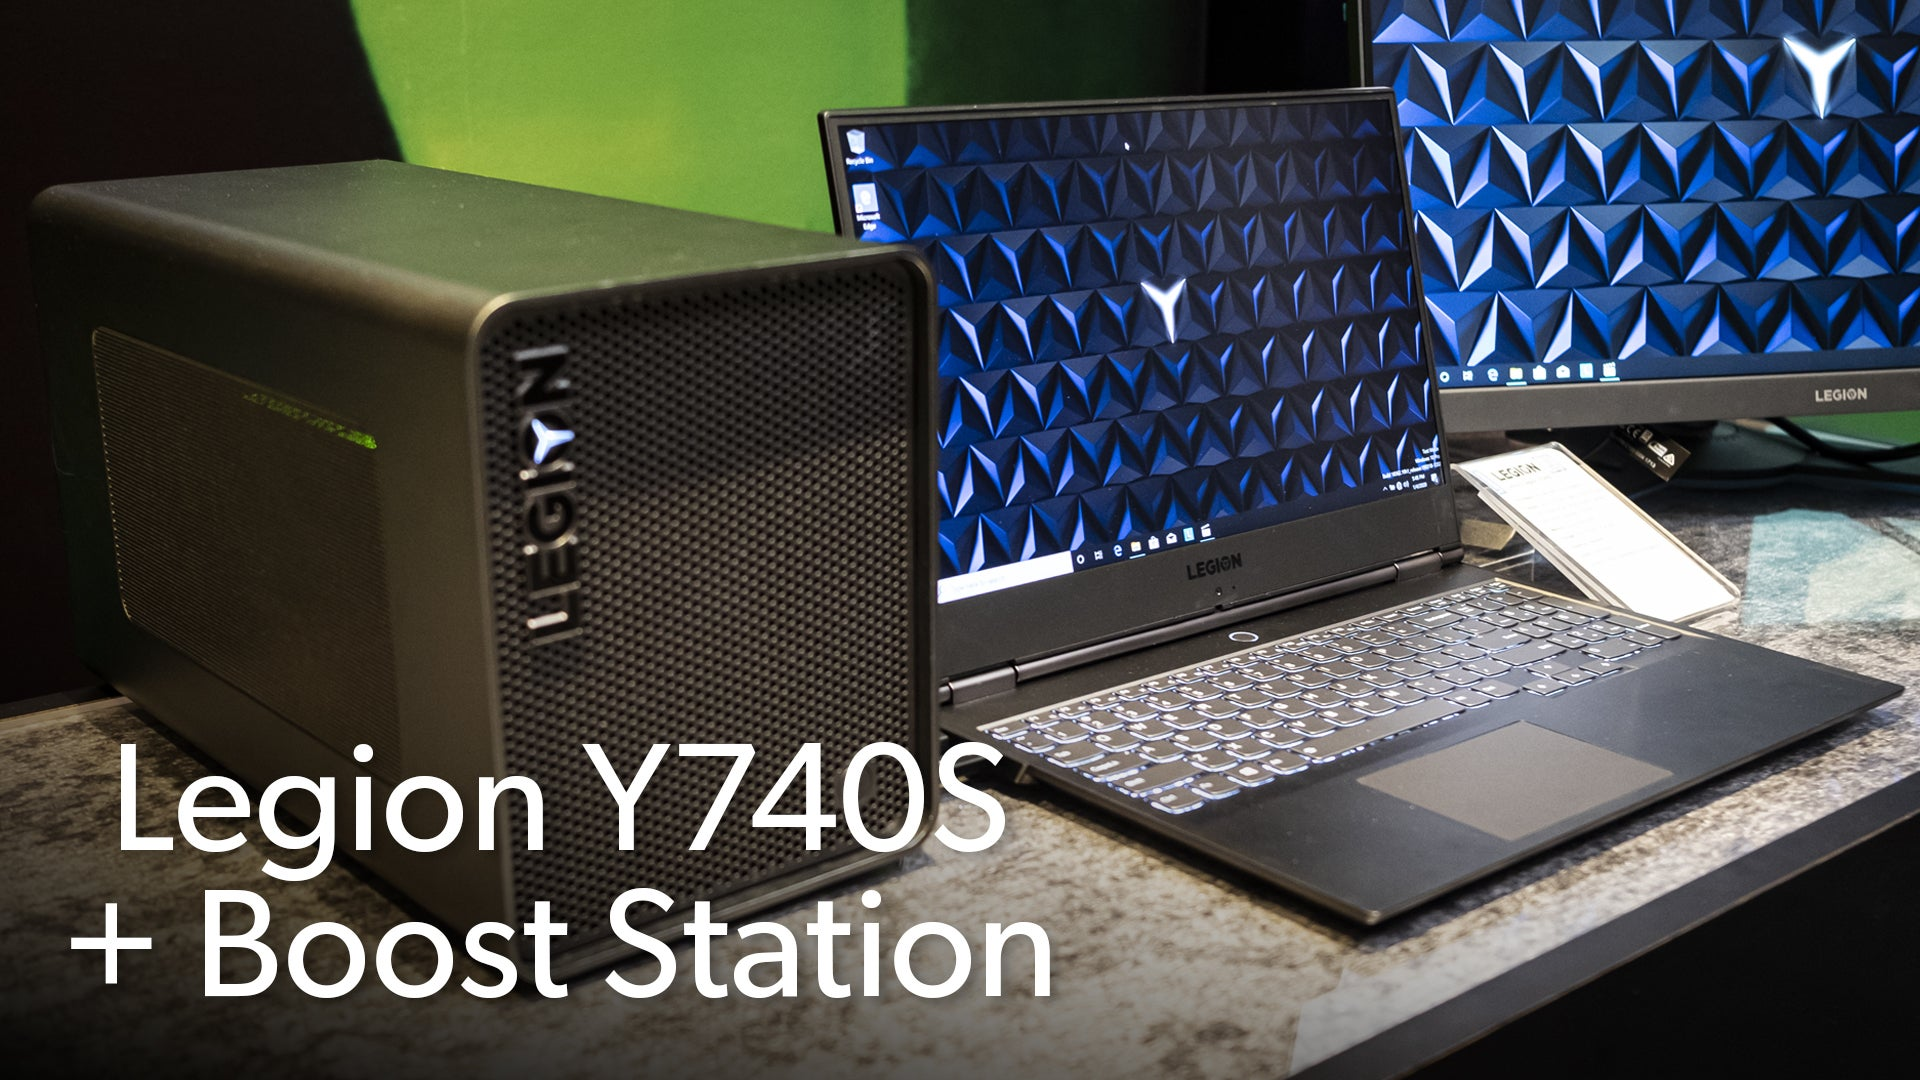 Lenovo Legion Y740S & Boost Station